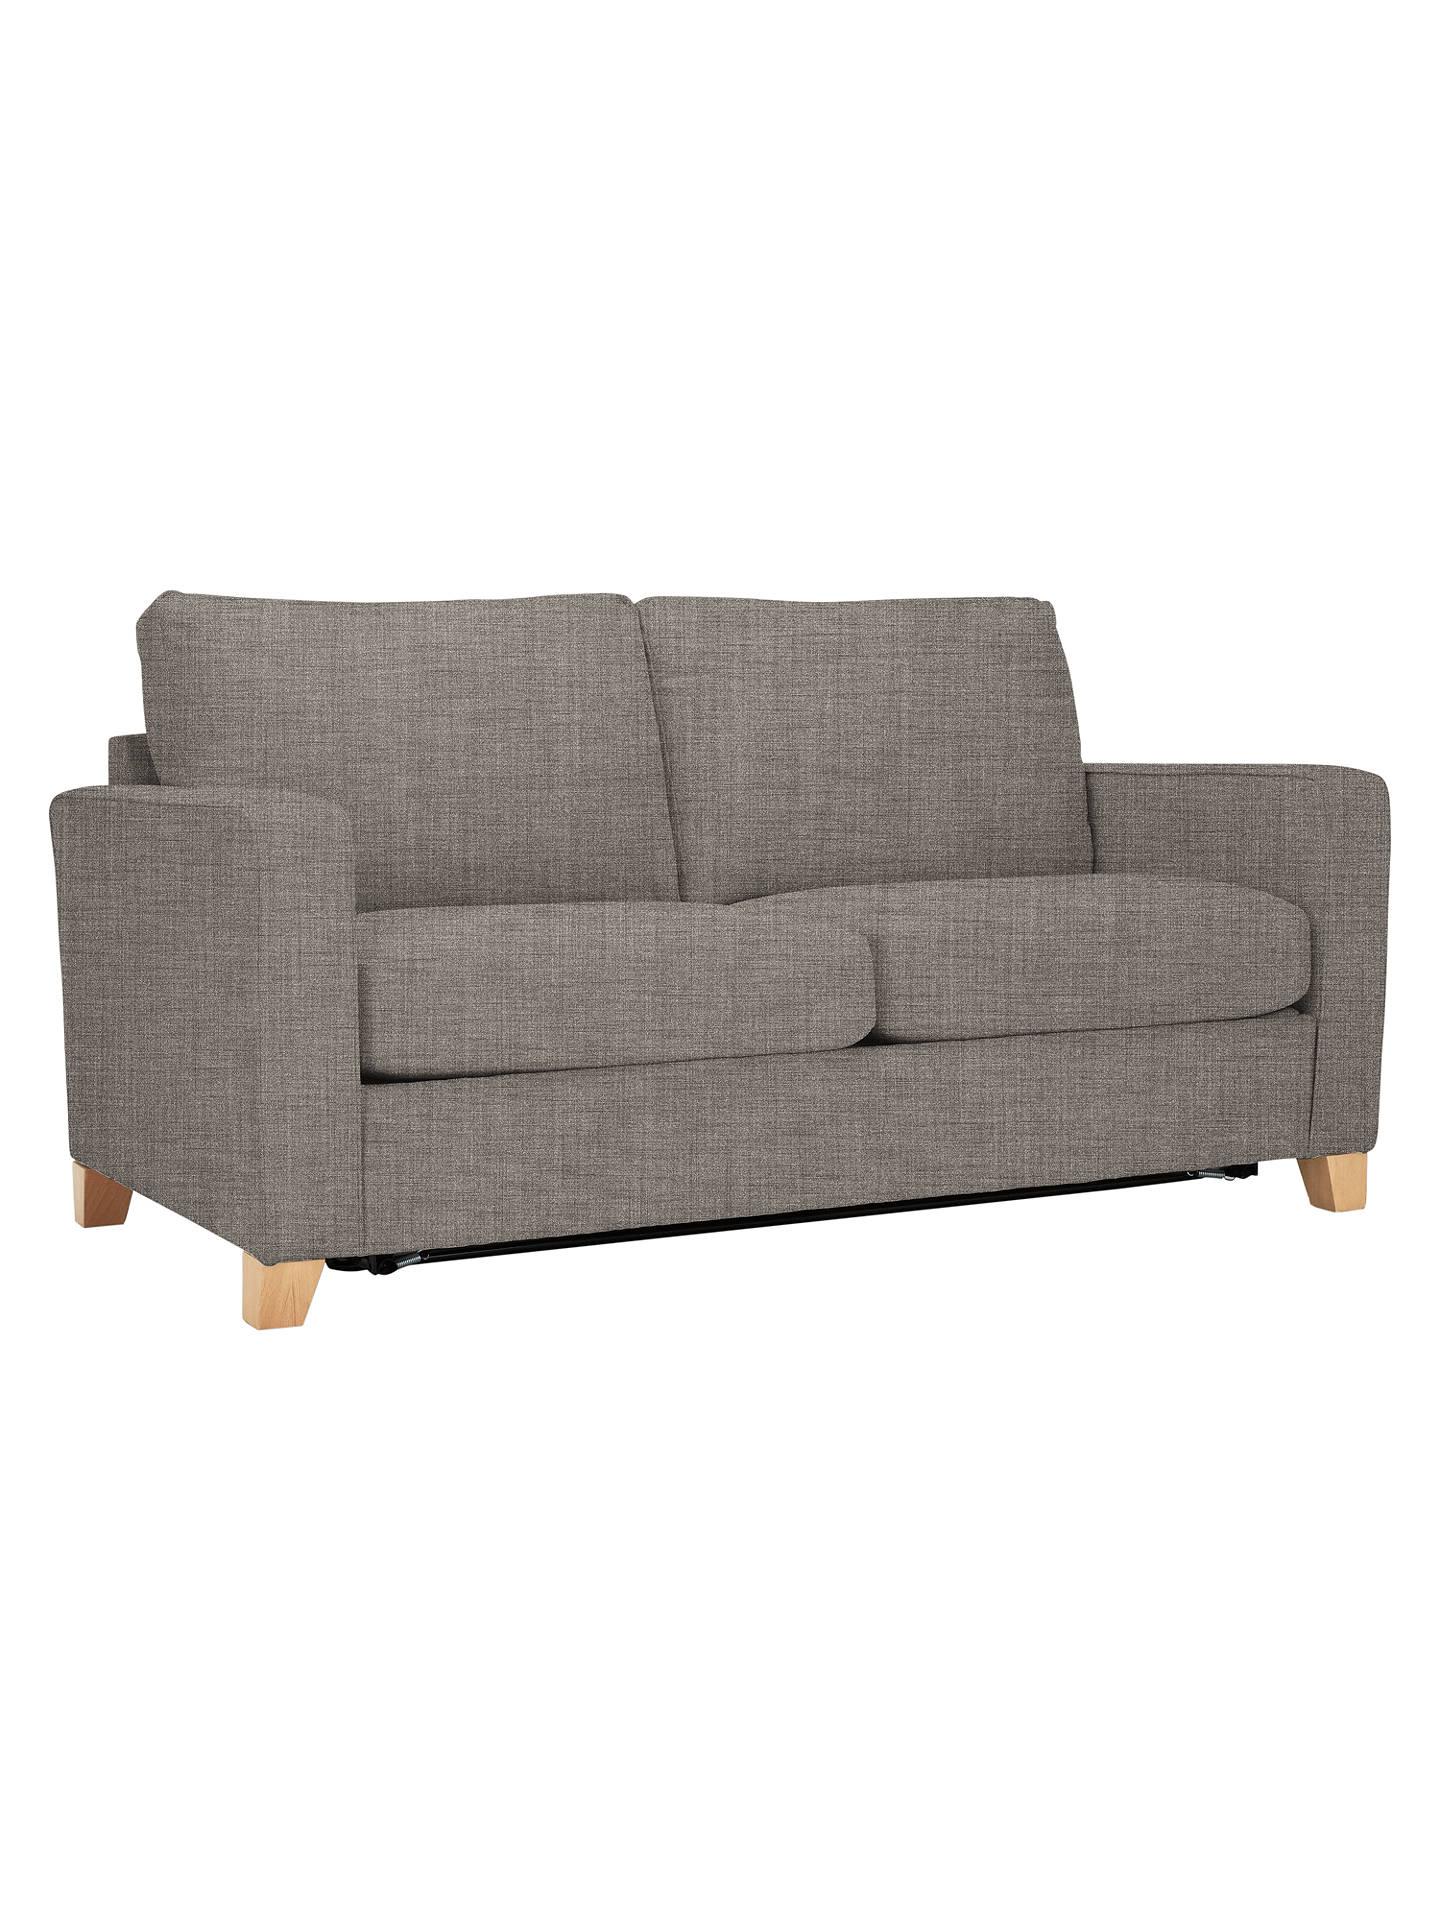 Fine John Lewis The Basics Jackson Medium 2 Seater Sofa Bed Ibusinesslaw Wood Chair Design Ideas Ibusinesslaworg